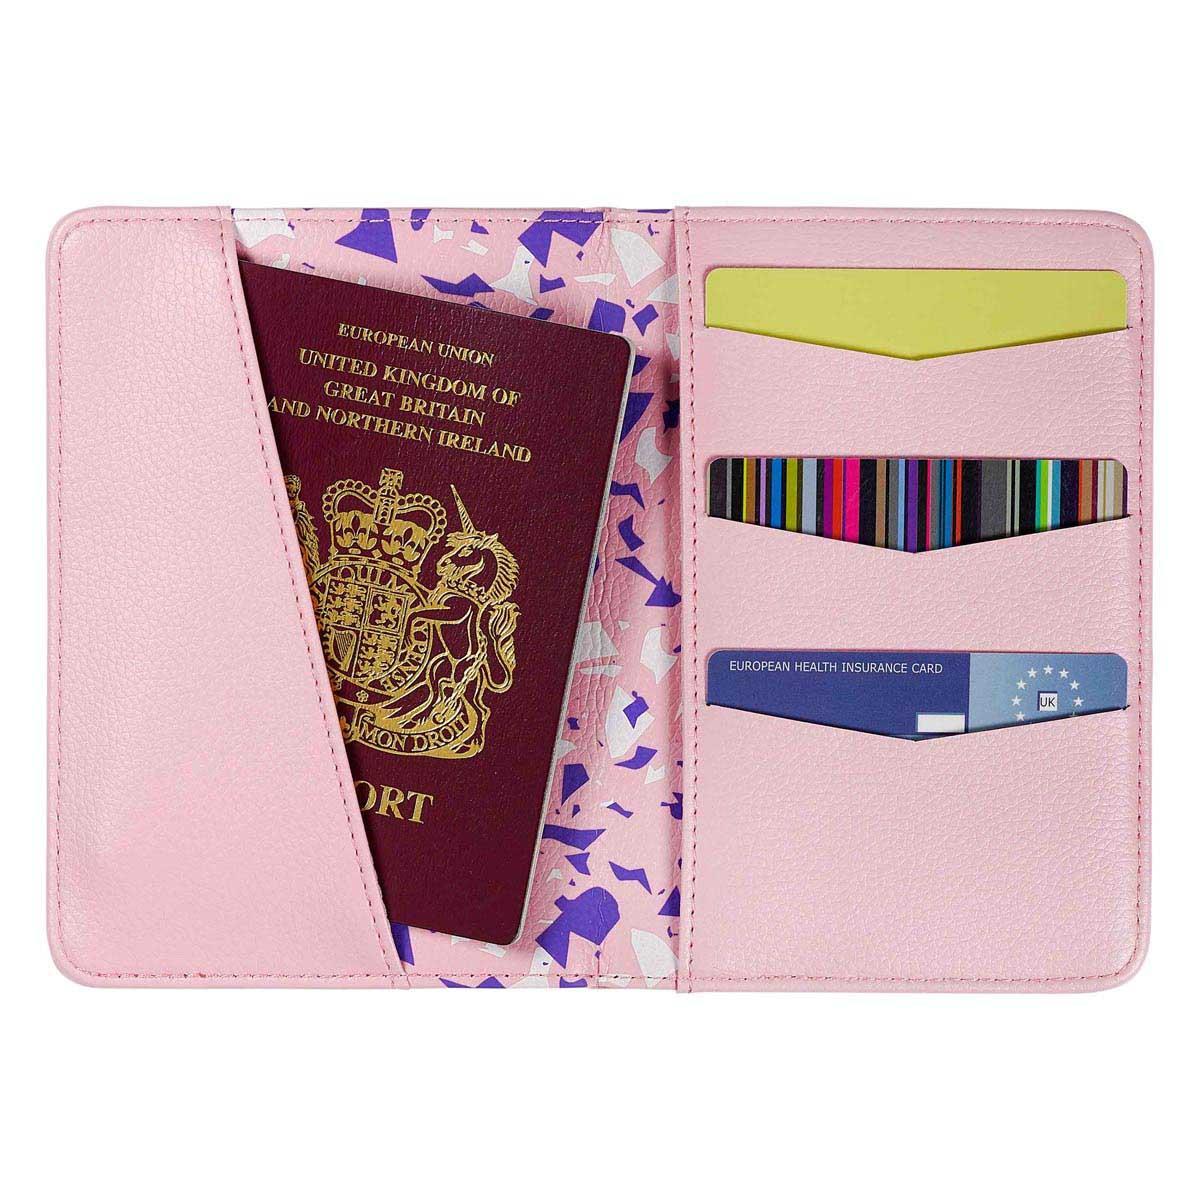 Futrola za pasoš ARE WE THERE YET